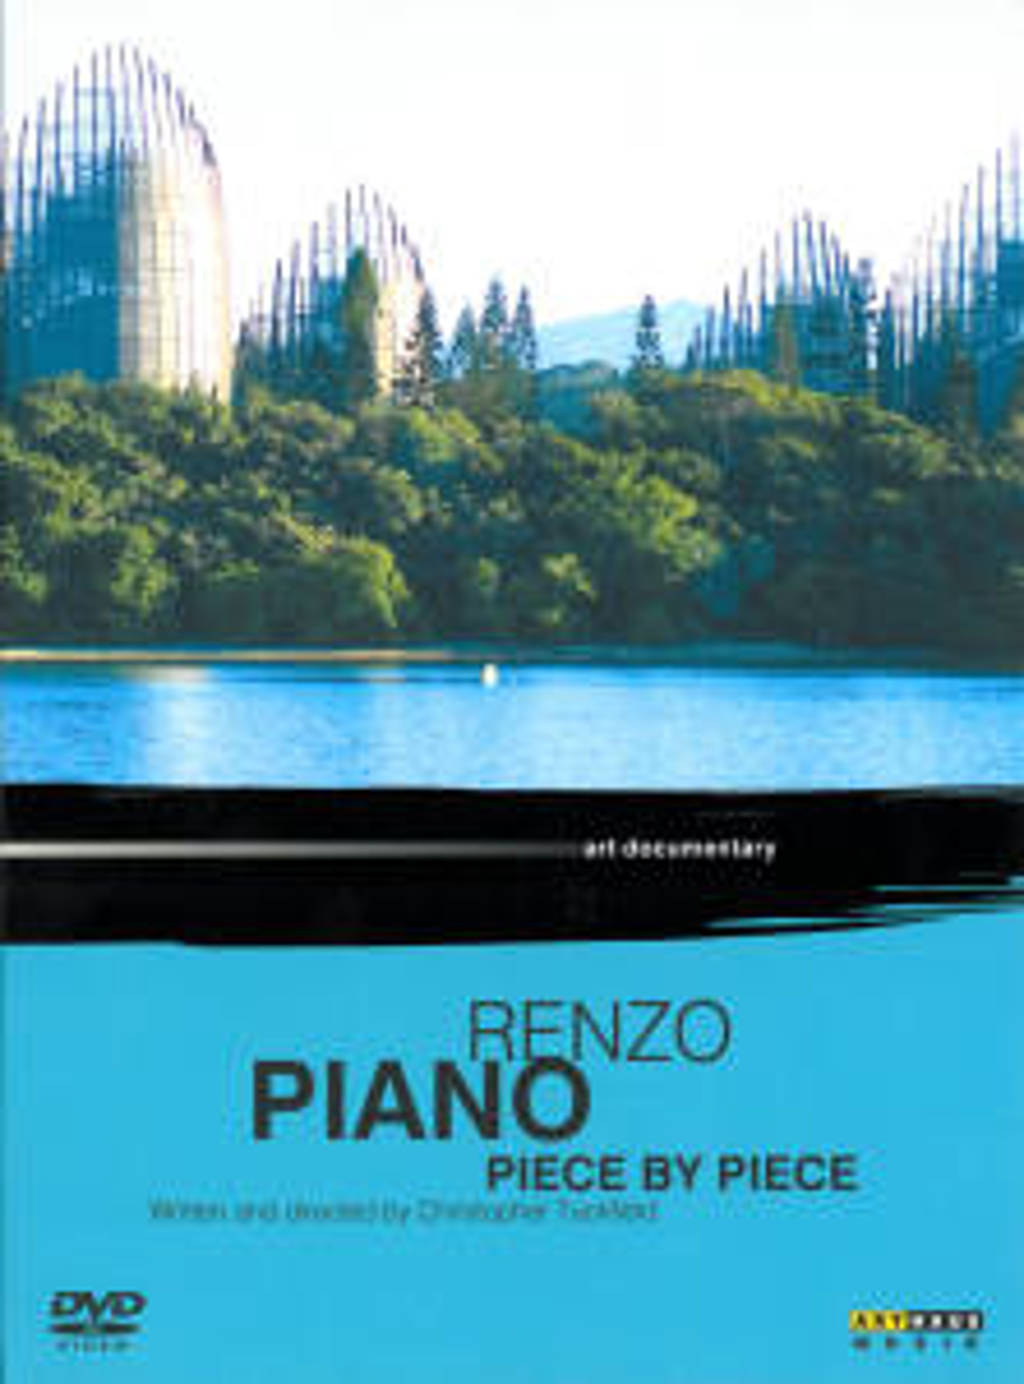 Piano - Renzo Piano (DVD)